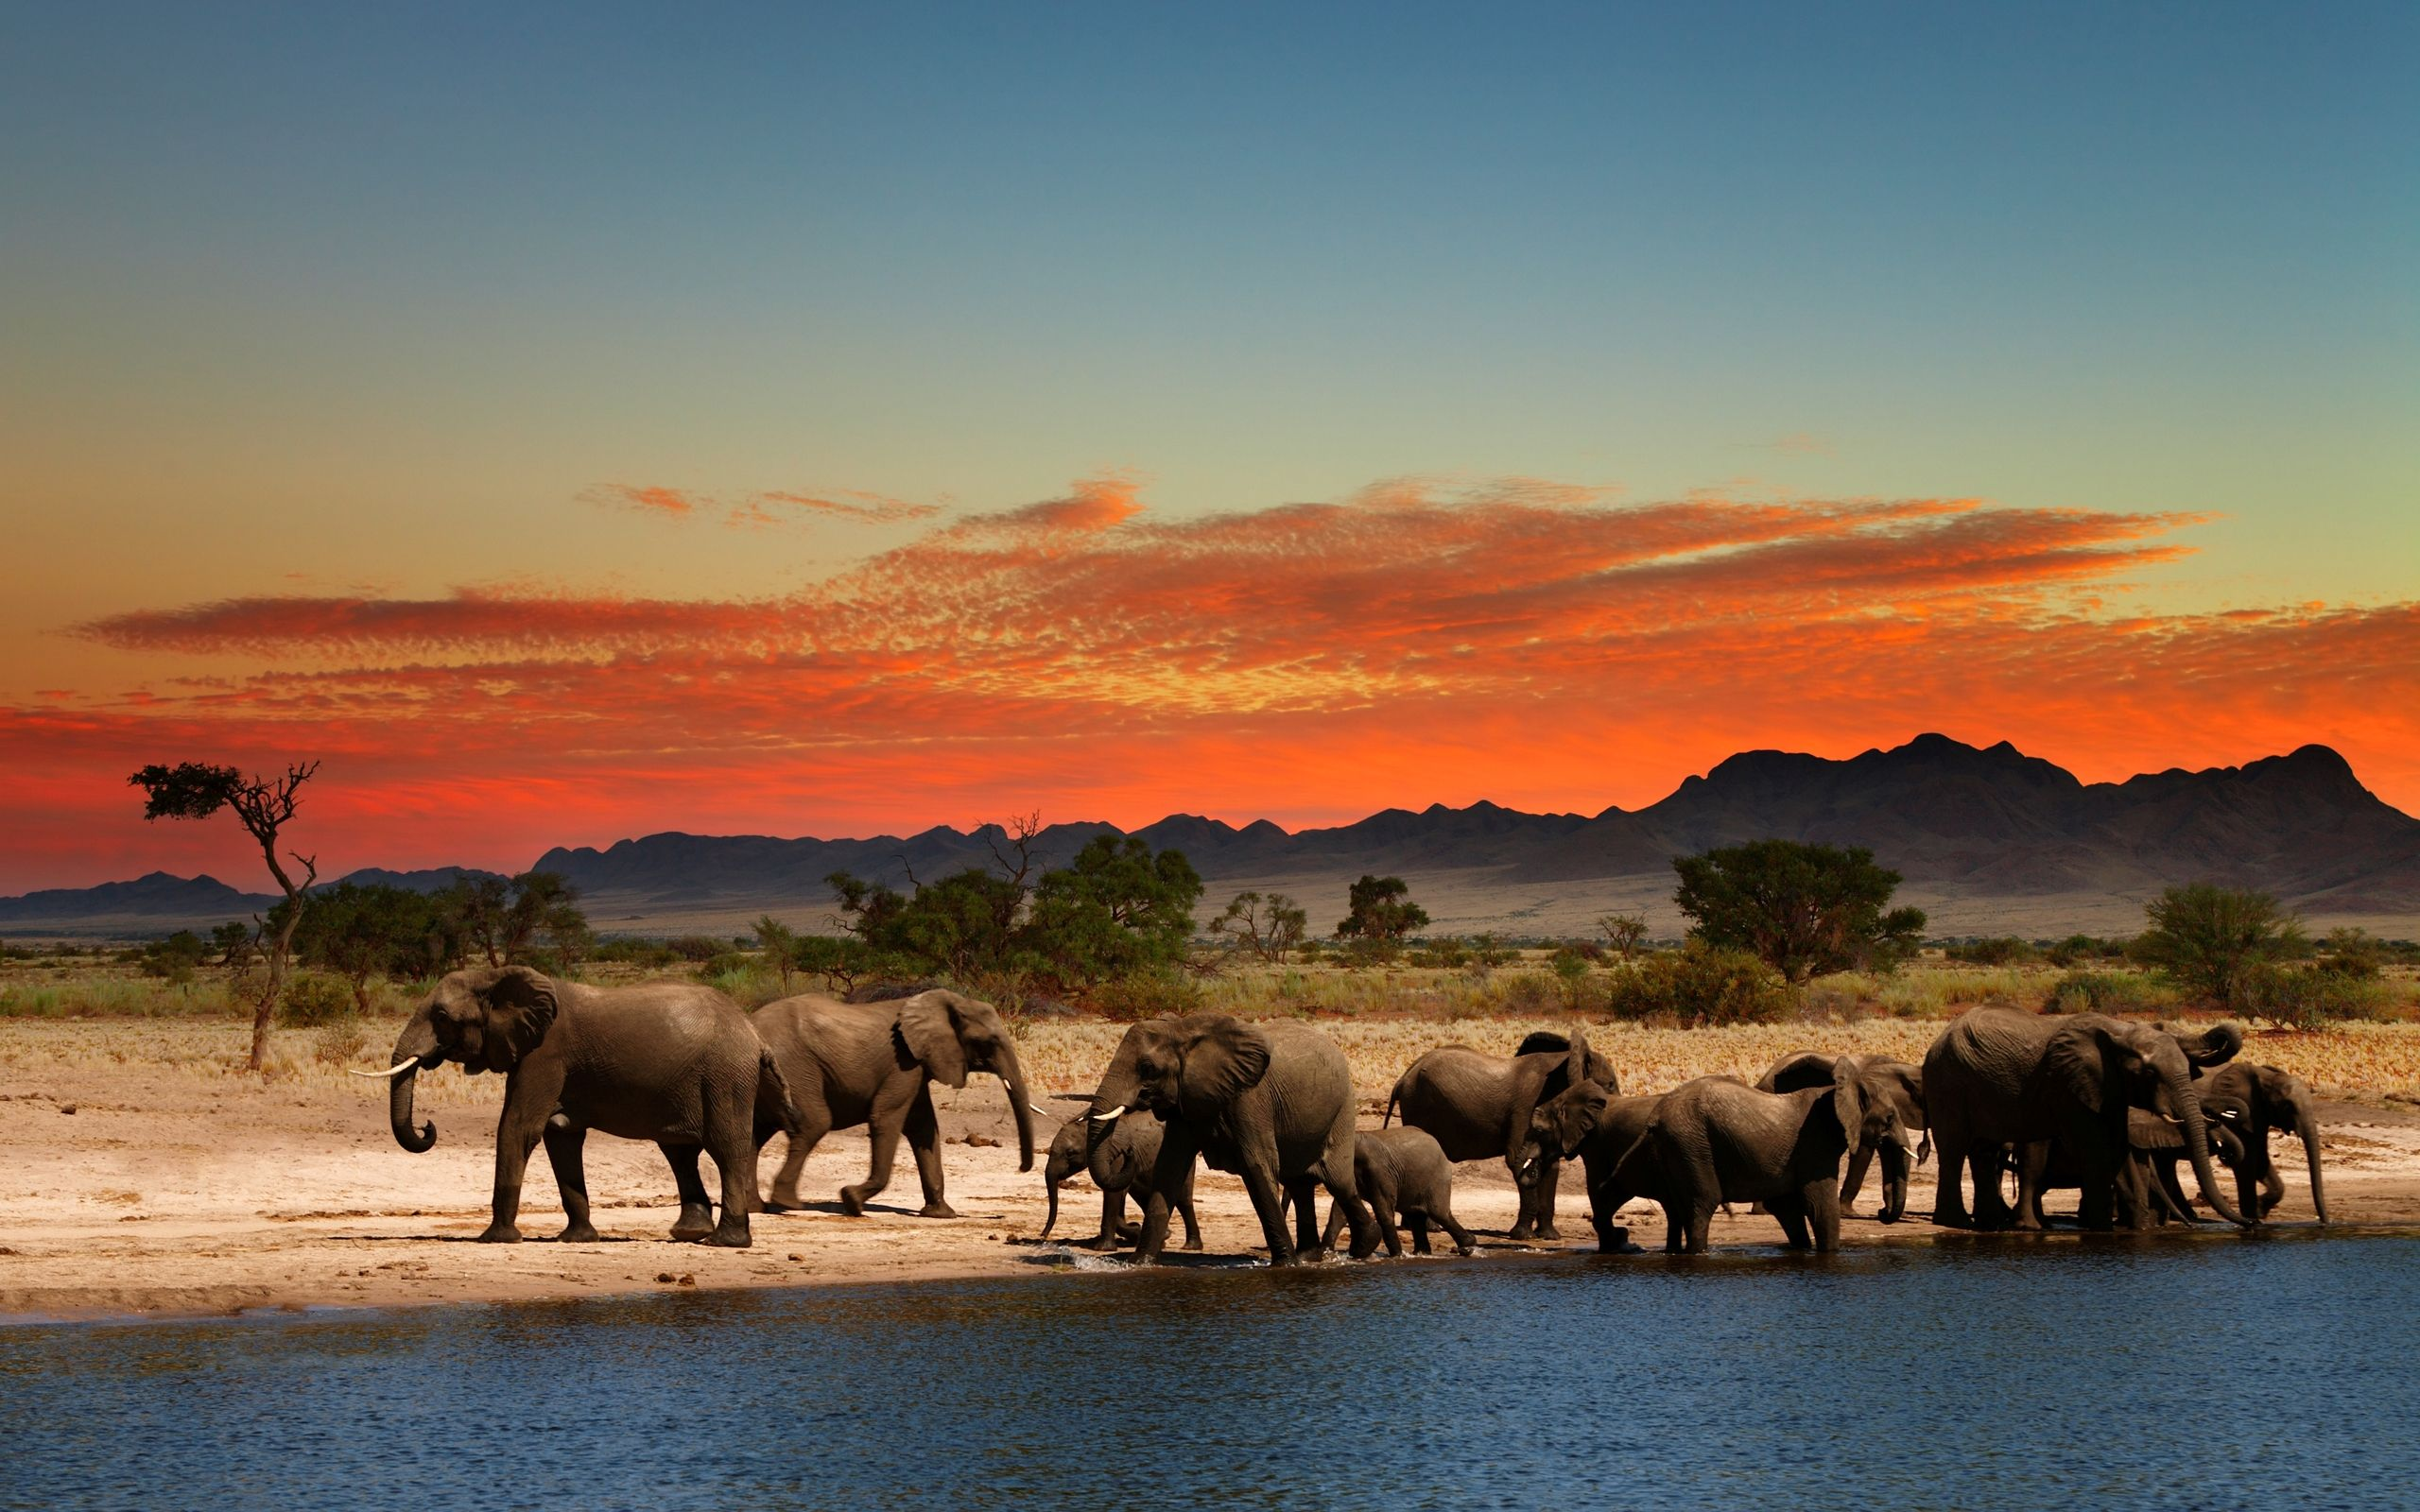 cute elephant wallpaper